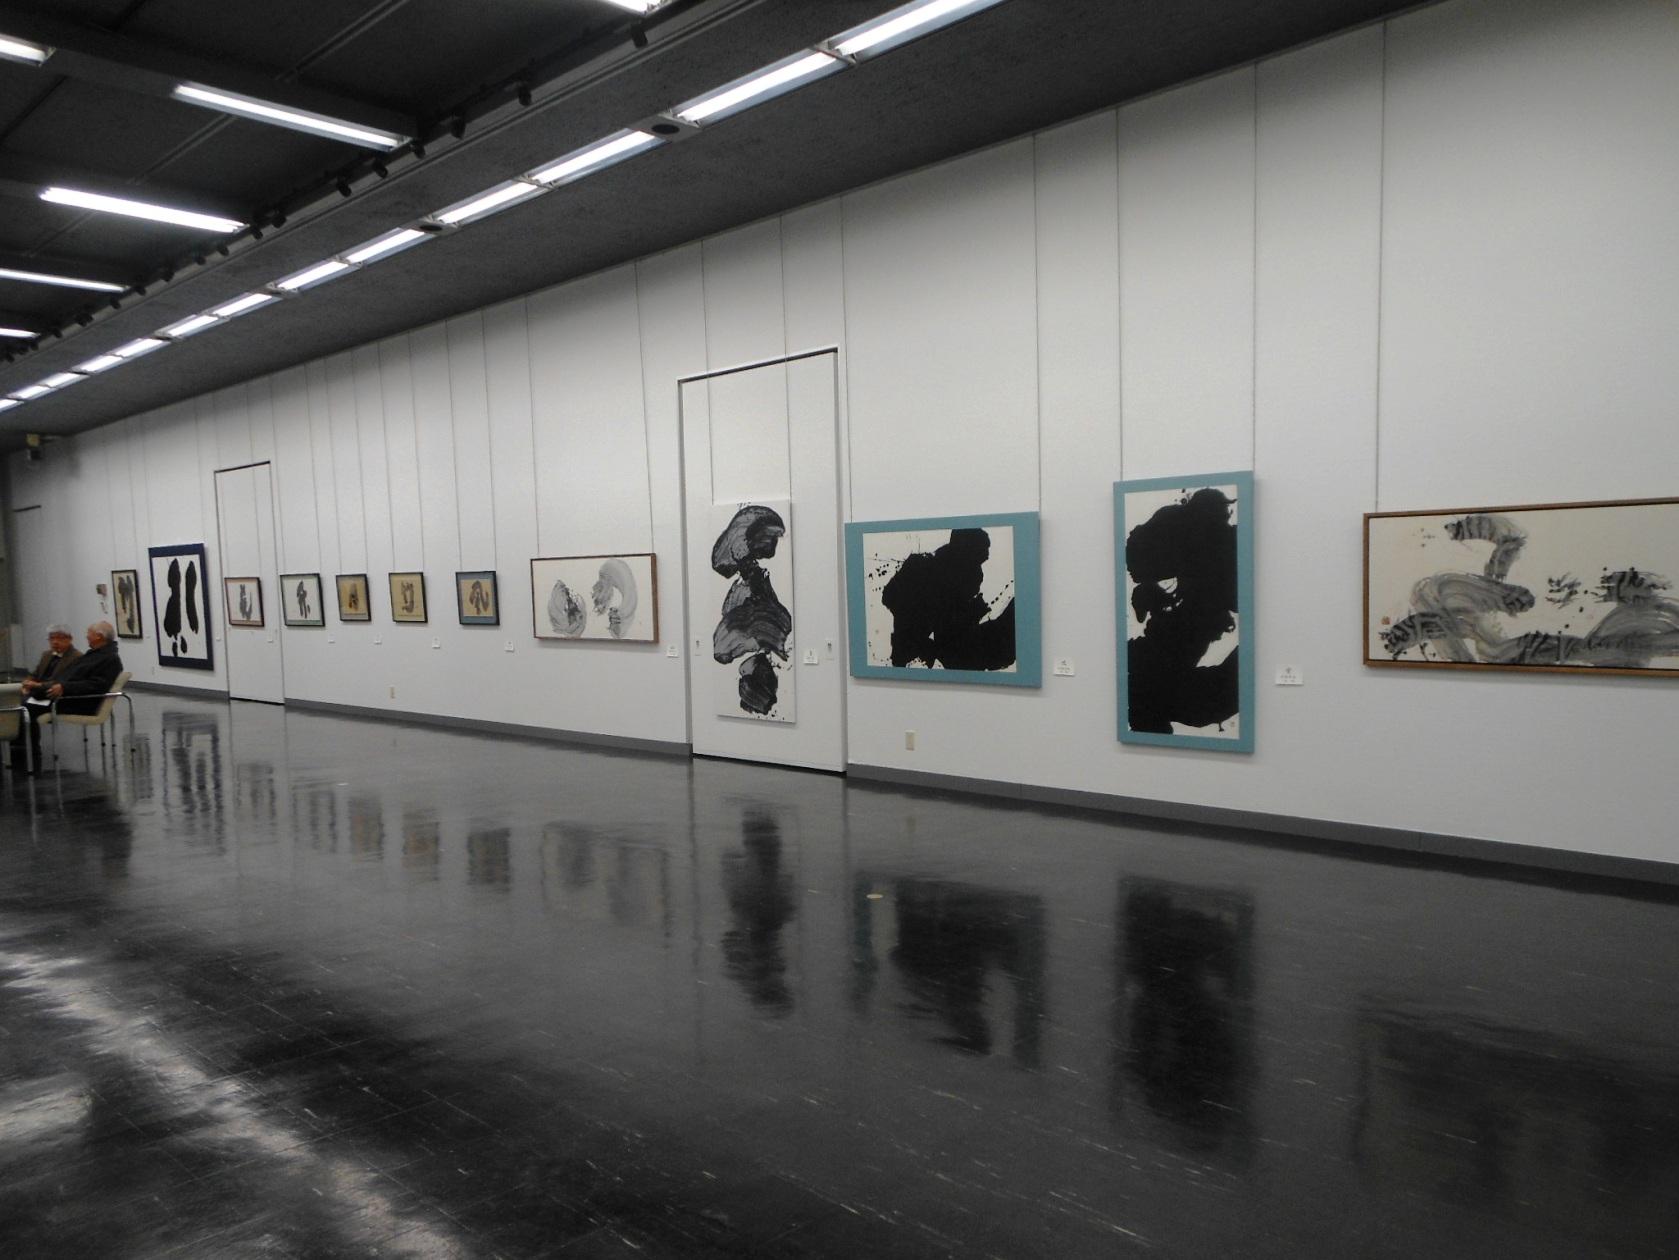 1690)「第26回 北海道墨人展」 市民ギャラリー 4月4日(水)~4月8日(日) _f0126829_16295799.jpg